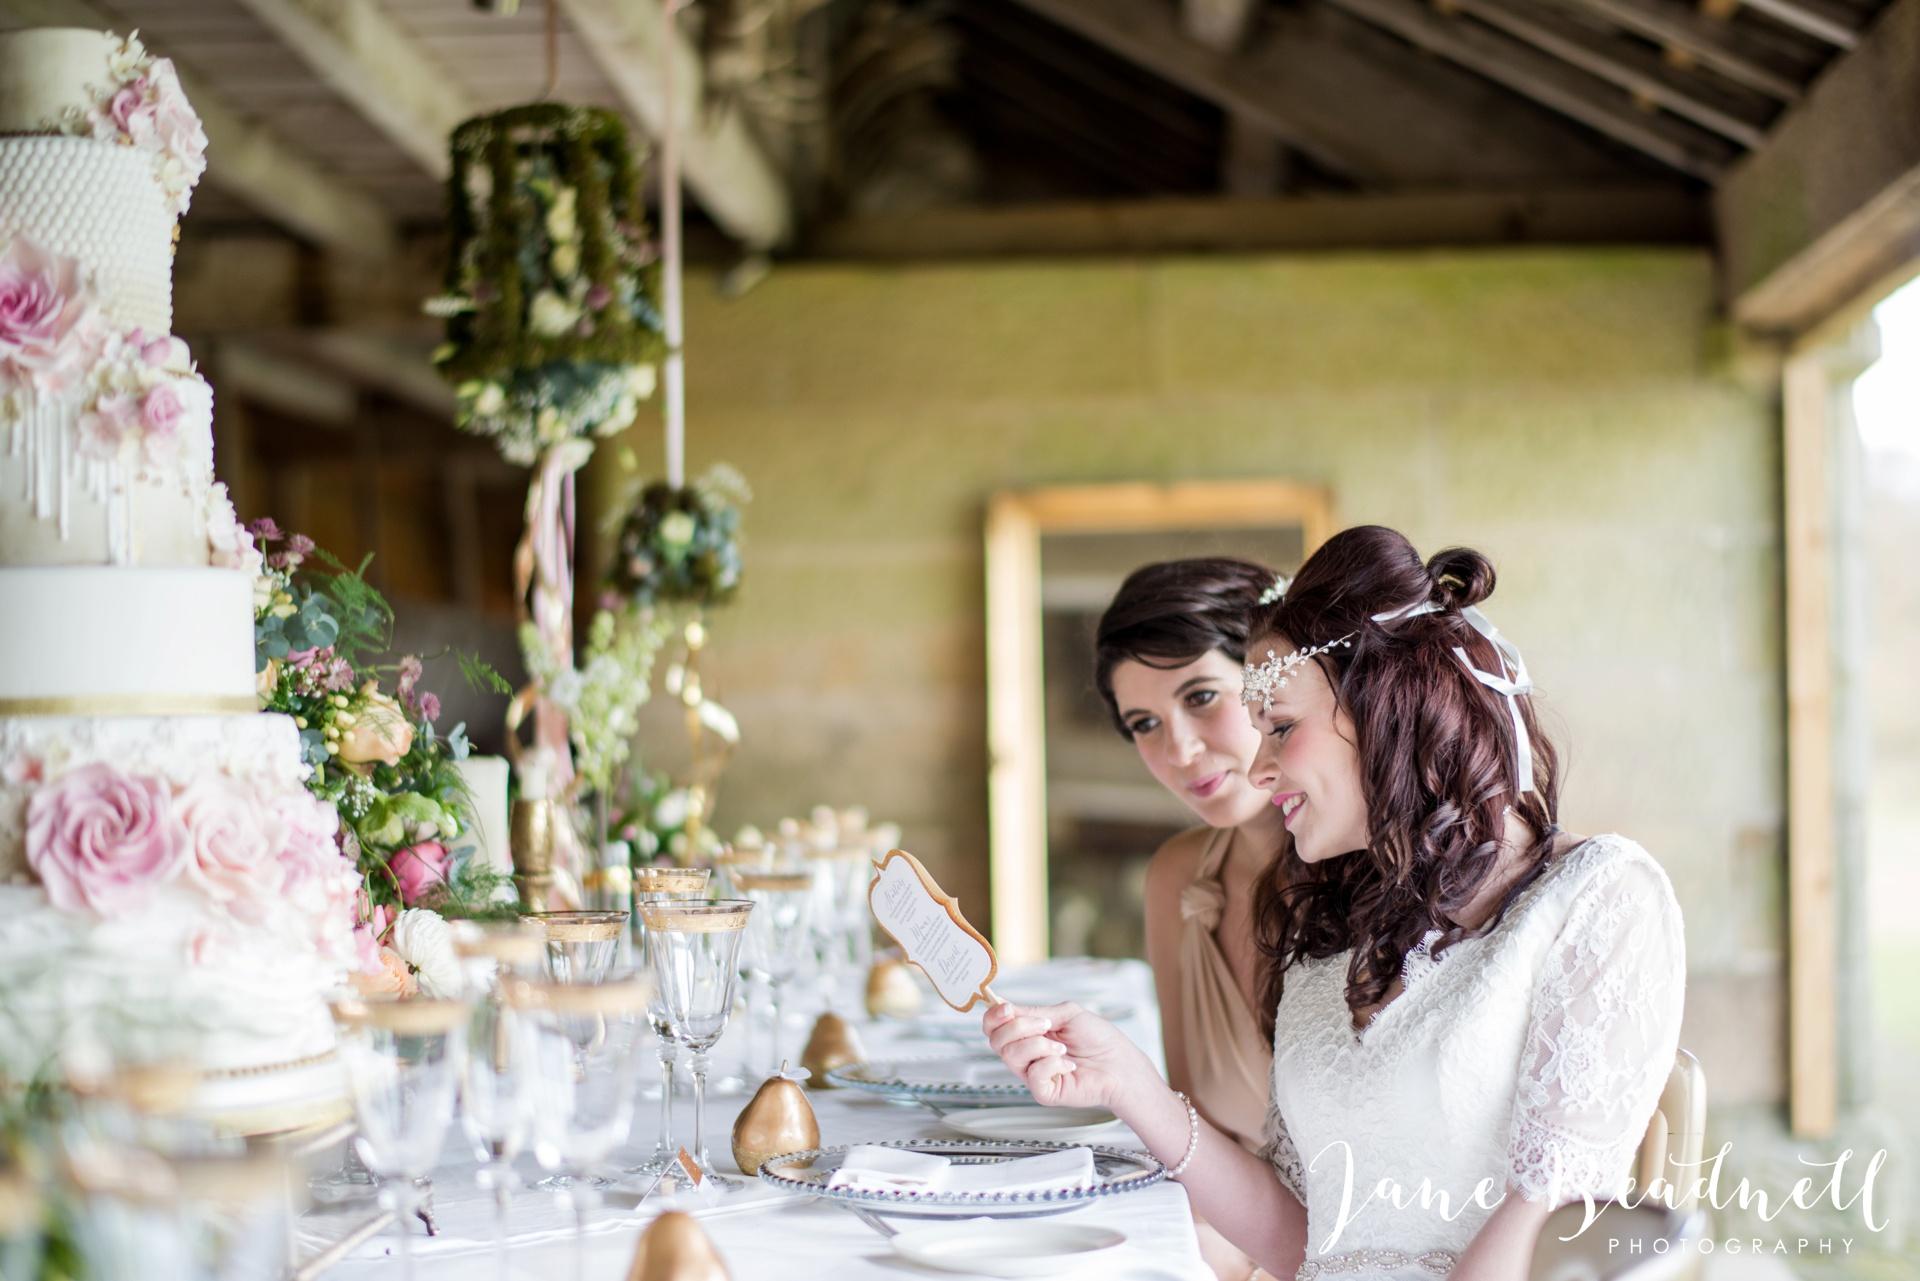 Jane Beadnell fine art wedding photographer Swinton Park18